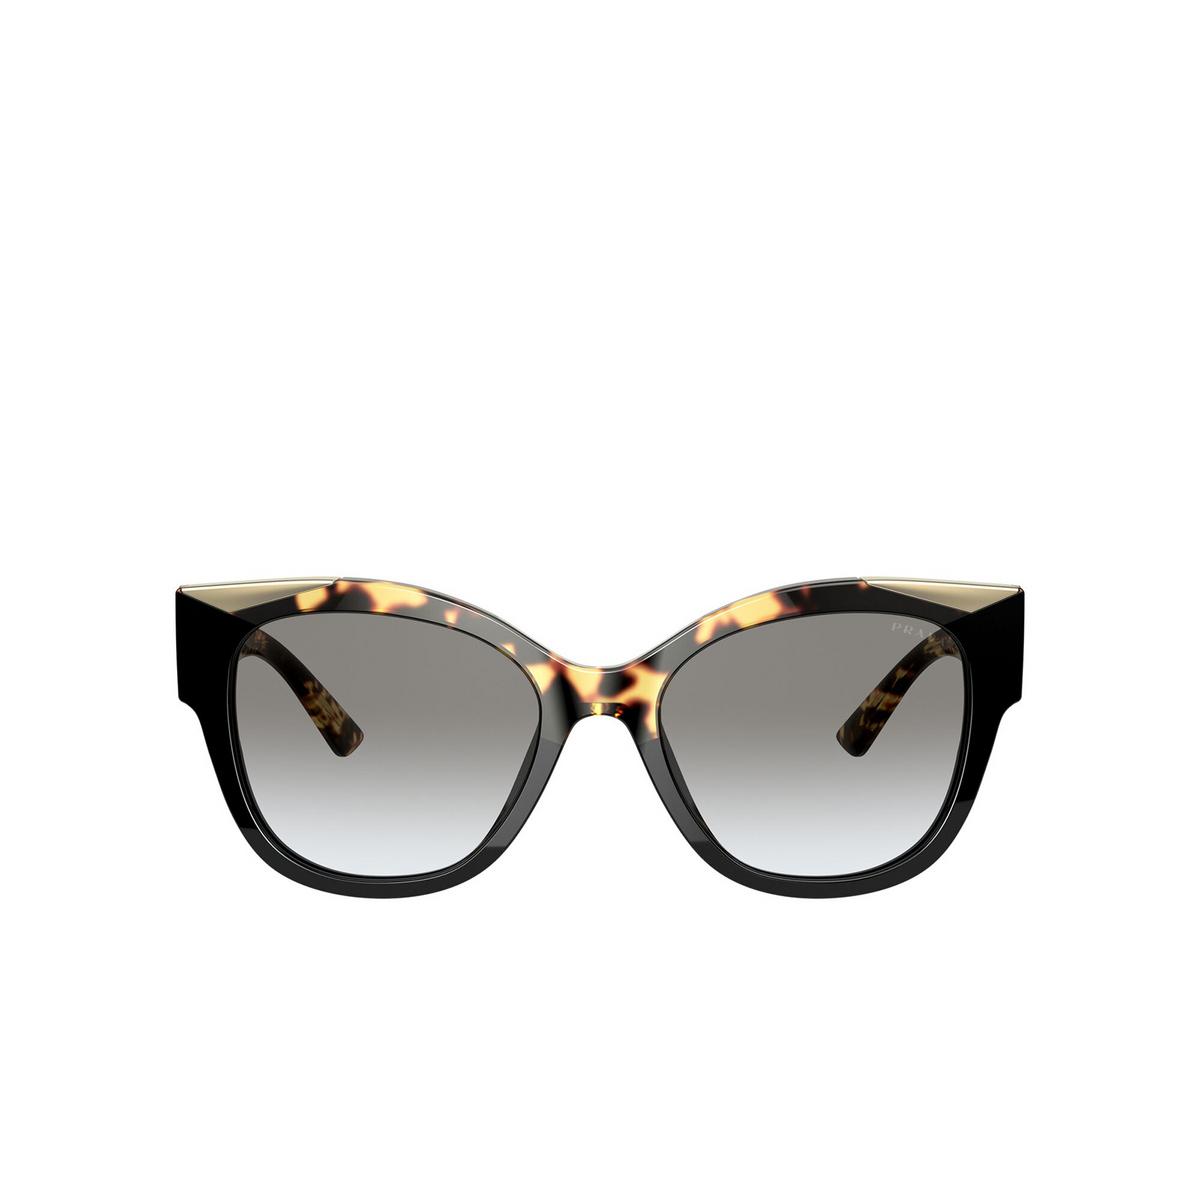 Prada® Butterfly Sunglasses: PR 02WS color Black / Medium Havana 01M0A7 - front view.